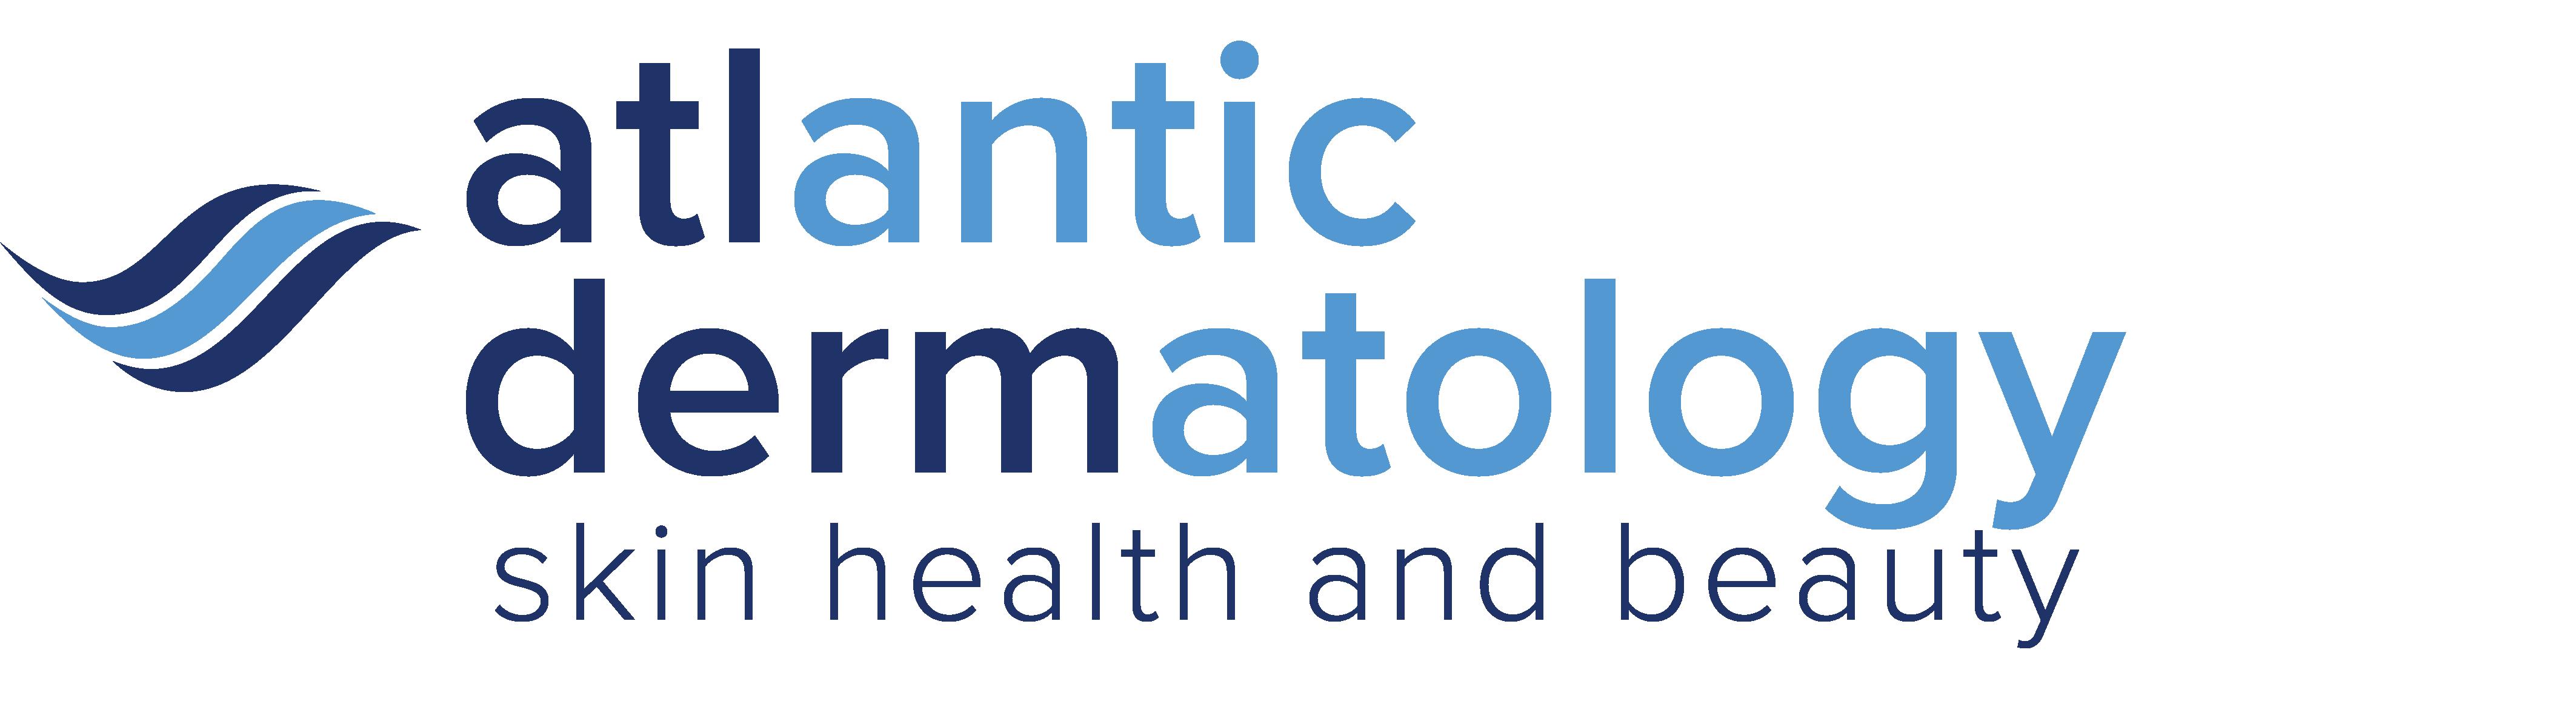 Atlantic Dermatology